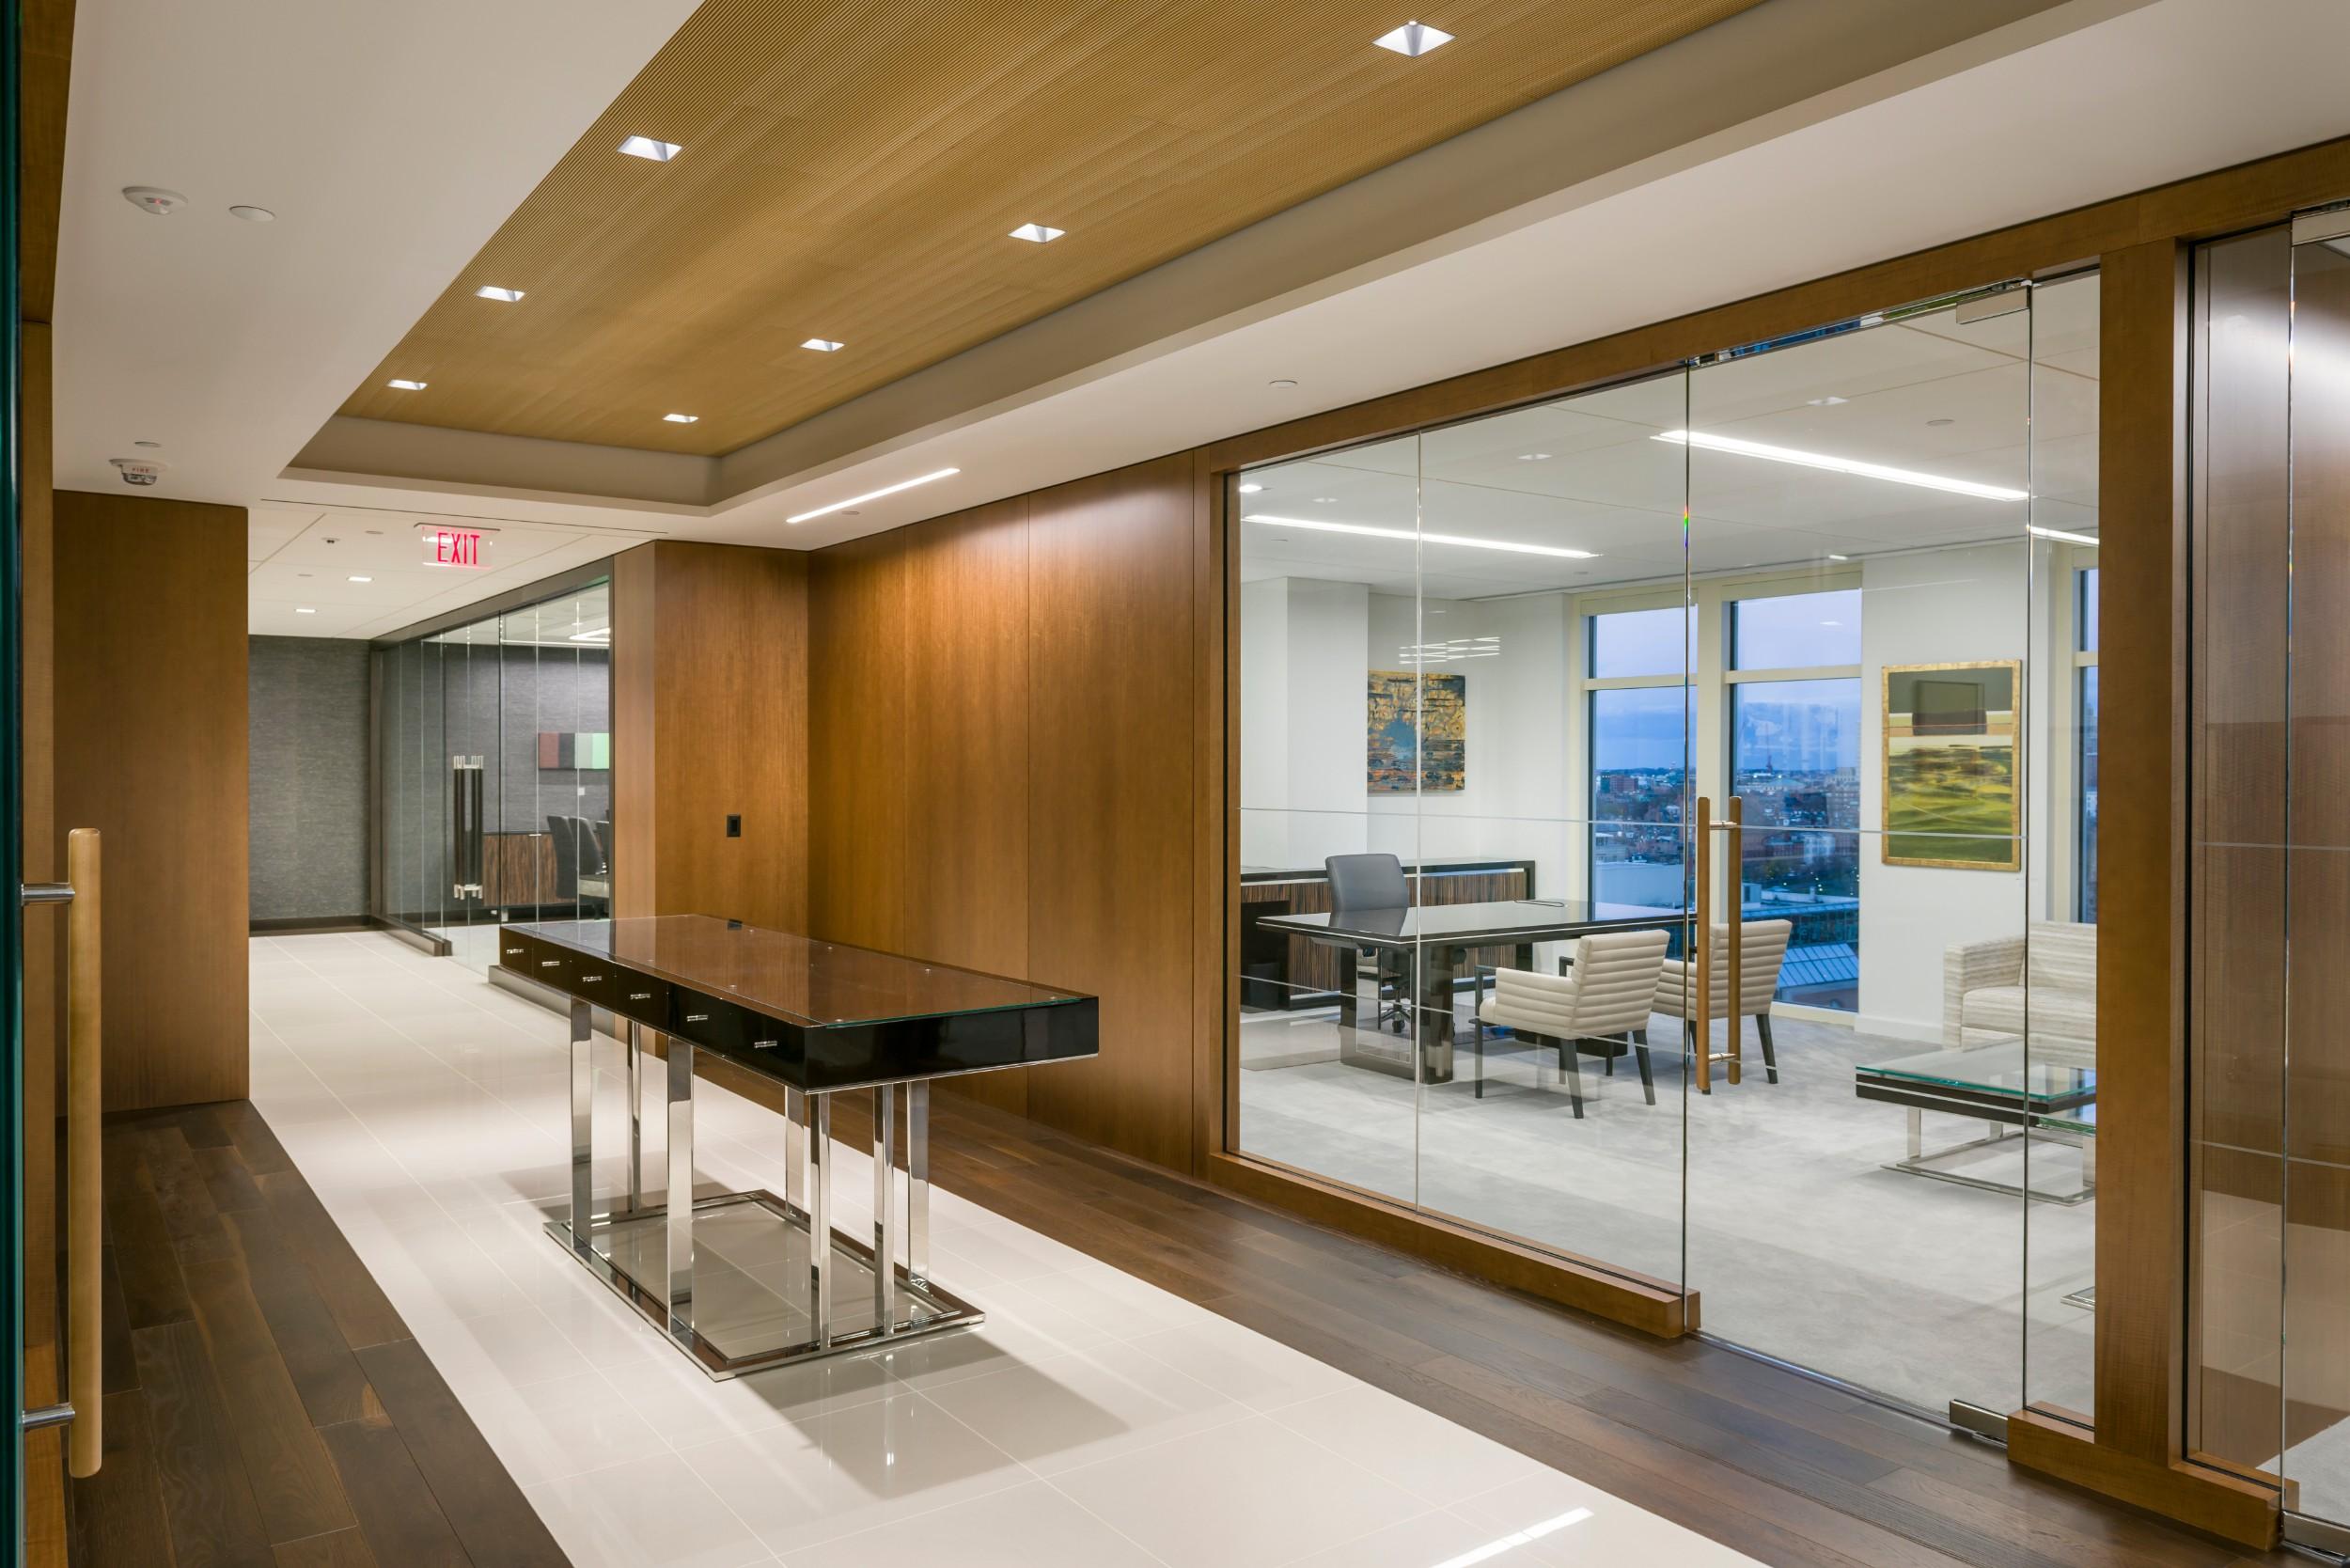 Corderman_Construction_Martignetti_Companies_Interior_Office_Buildout_Hallway_Office_View.jpg